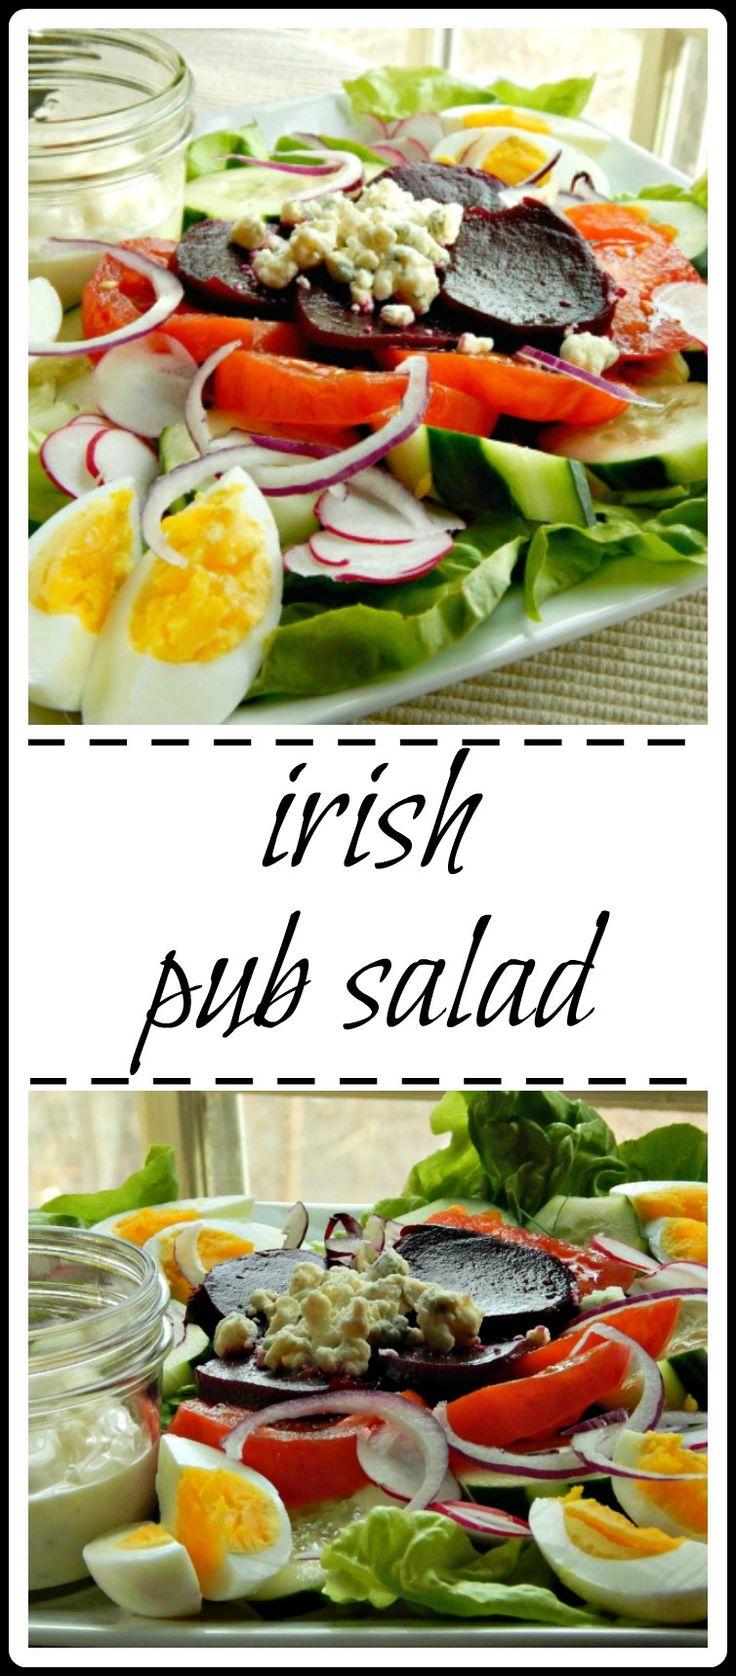 Irish Pub Salad - Full of everything good! And that dressing! OMG!